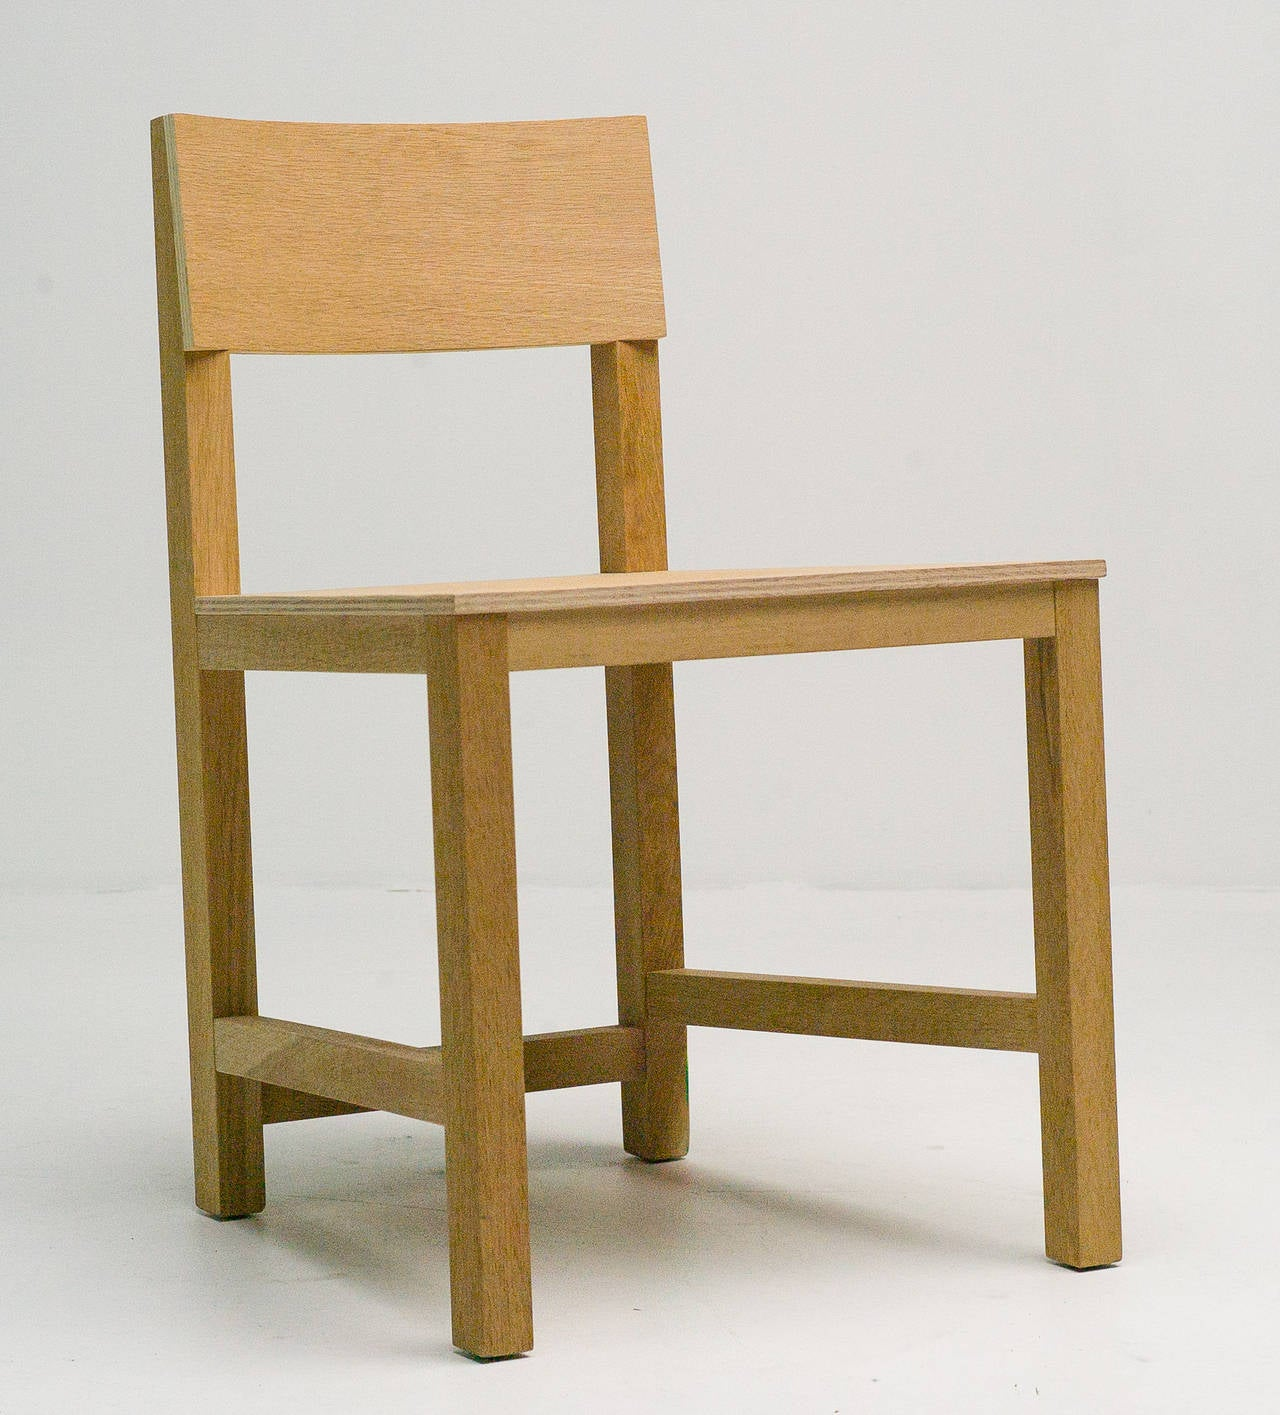 avl shaker chair by joep van lieshout for sale at 1stdibs